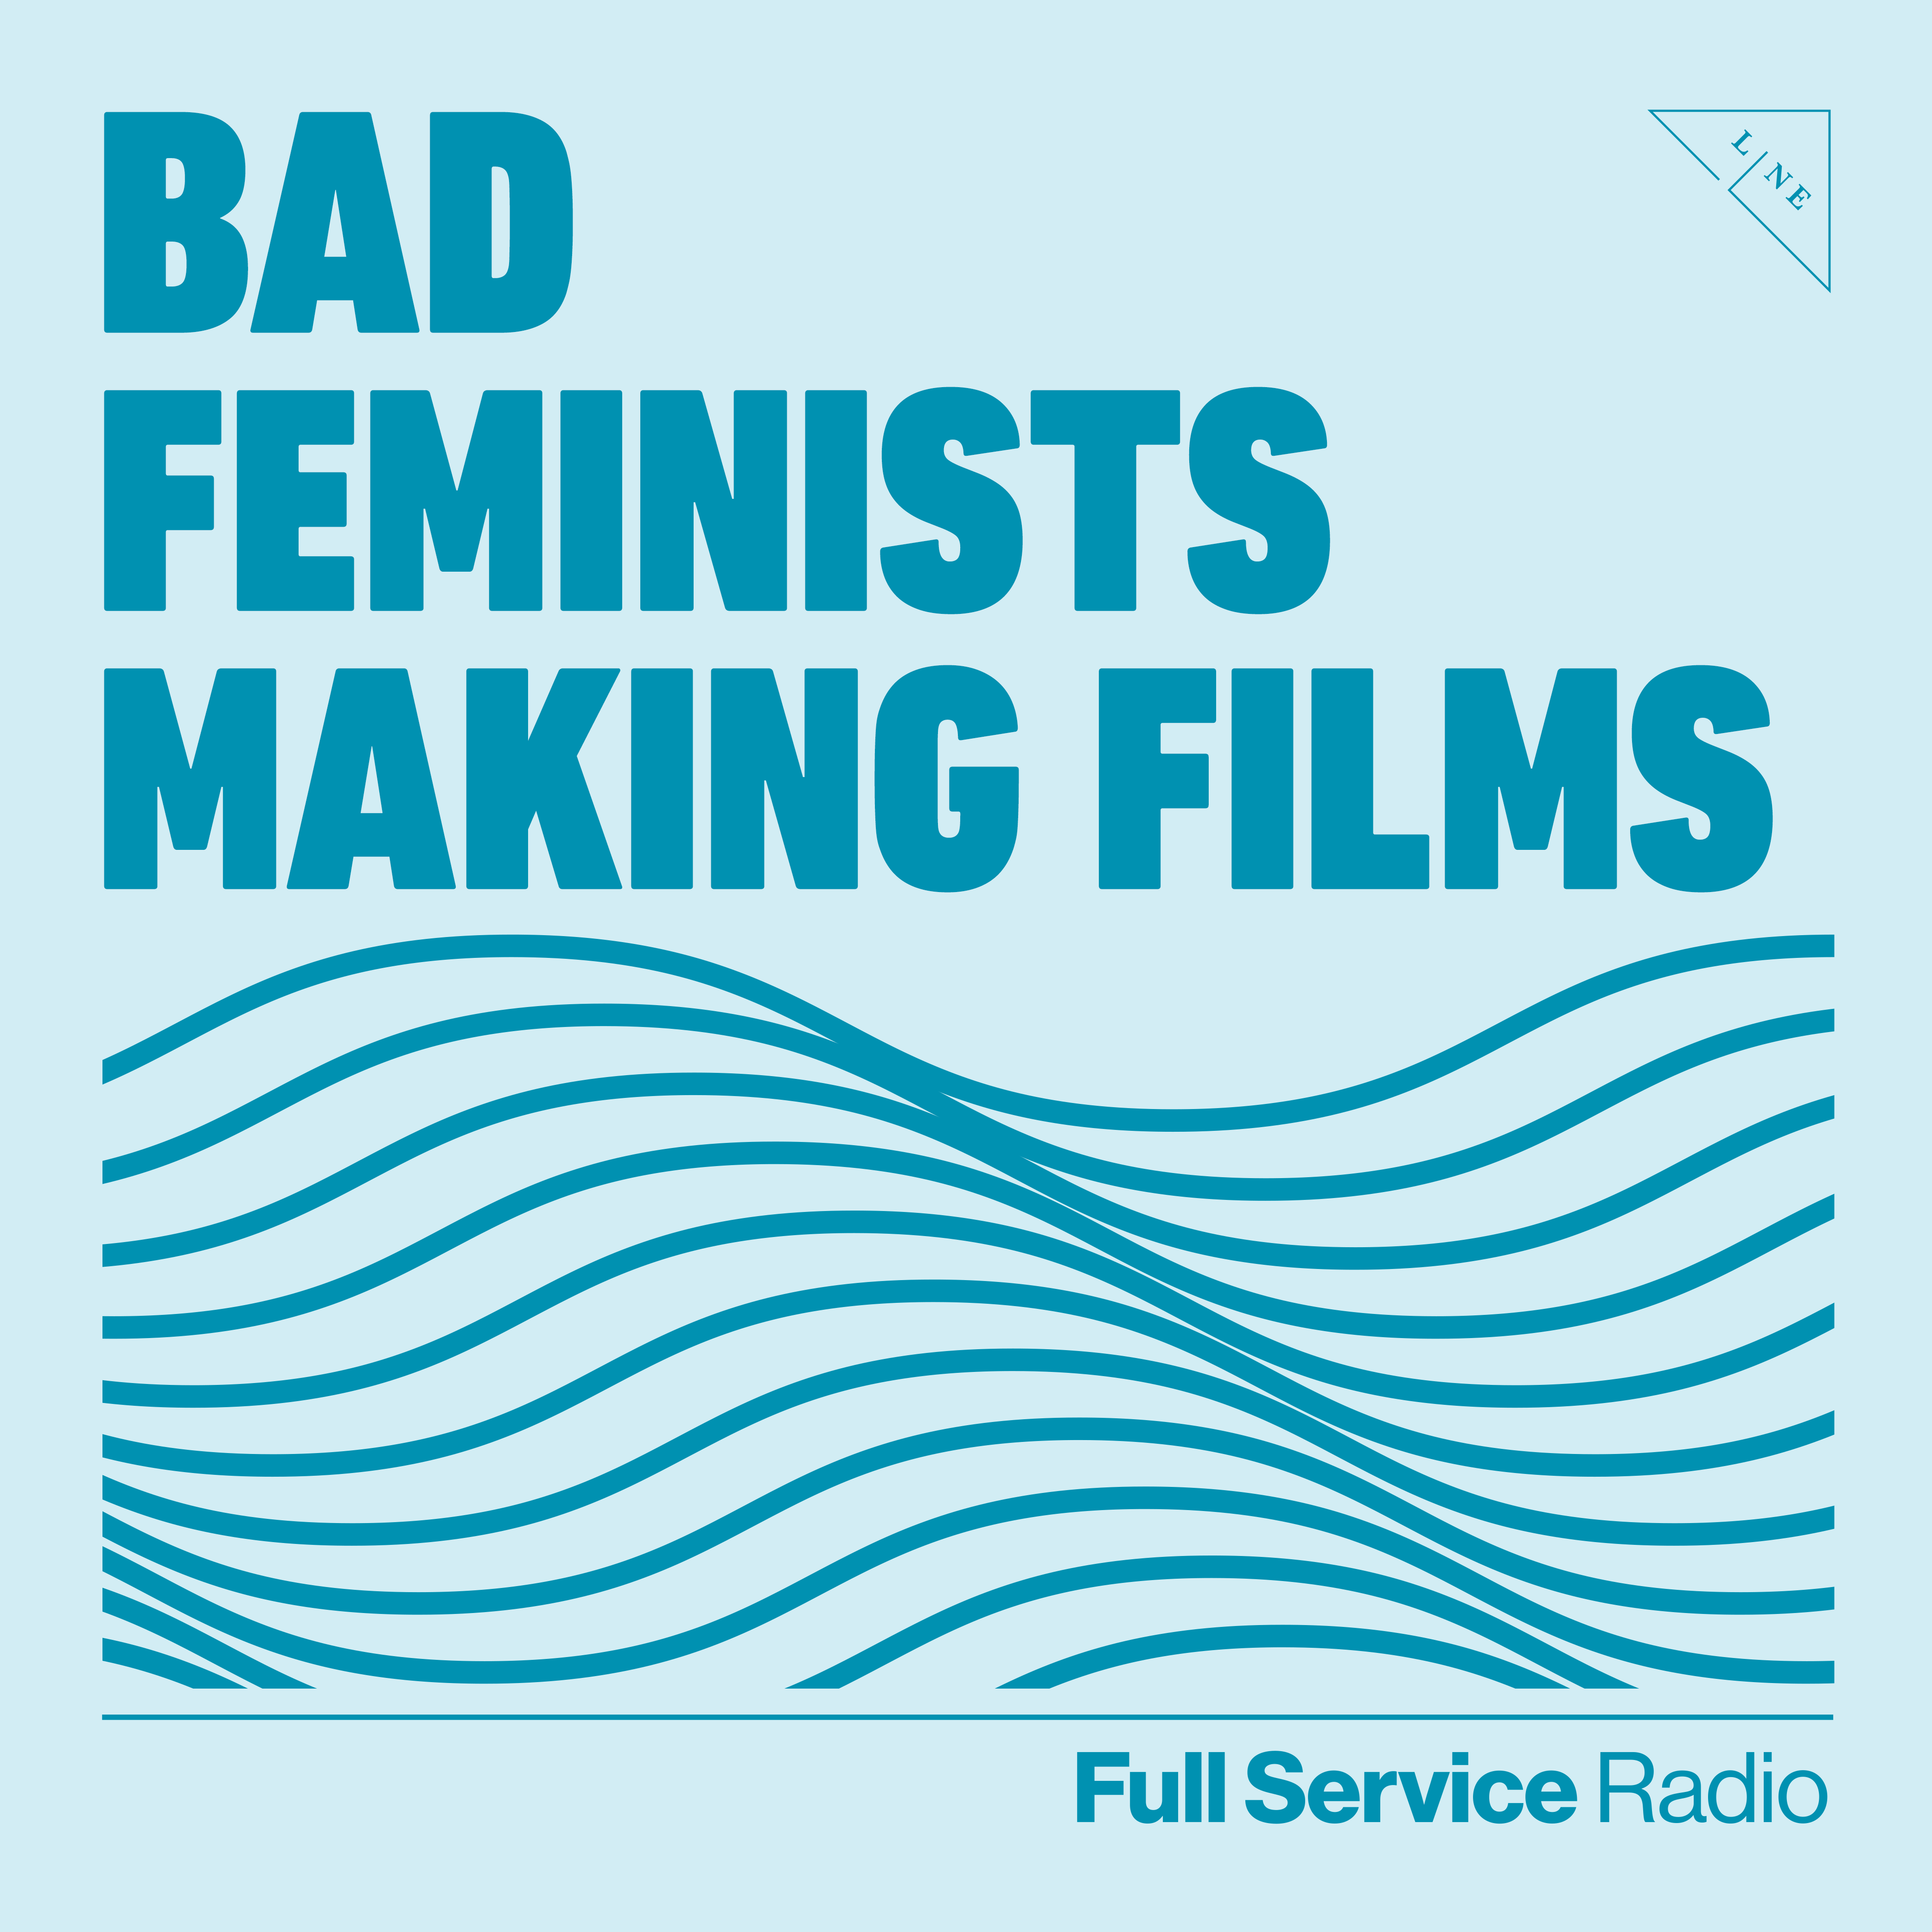 Bad 20feminists 202